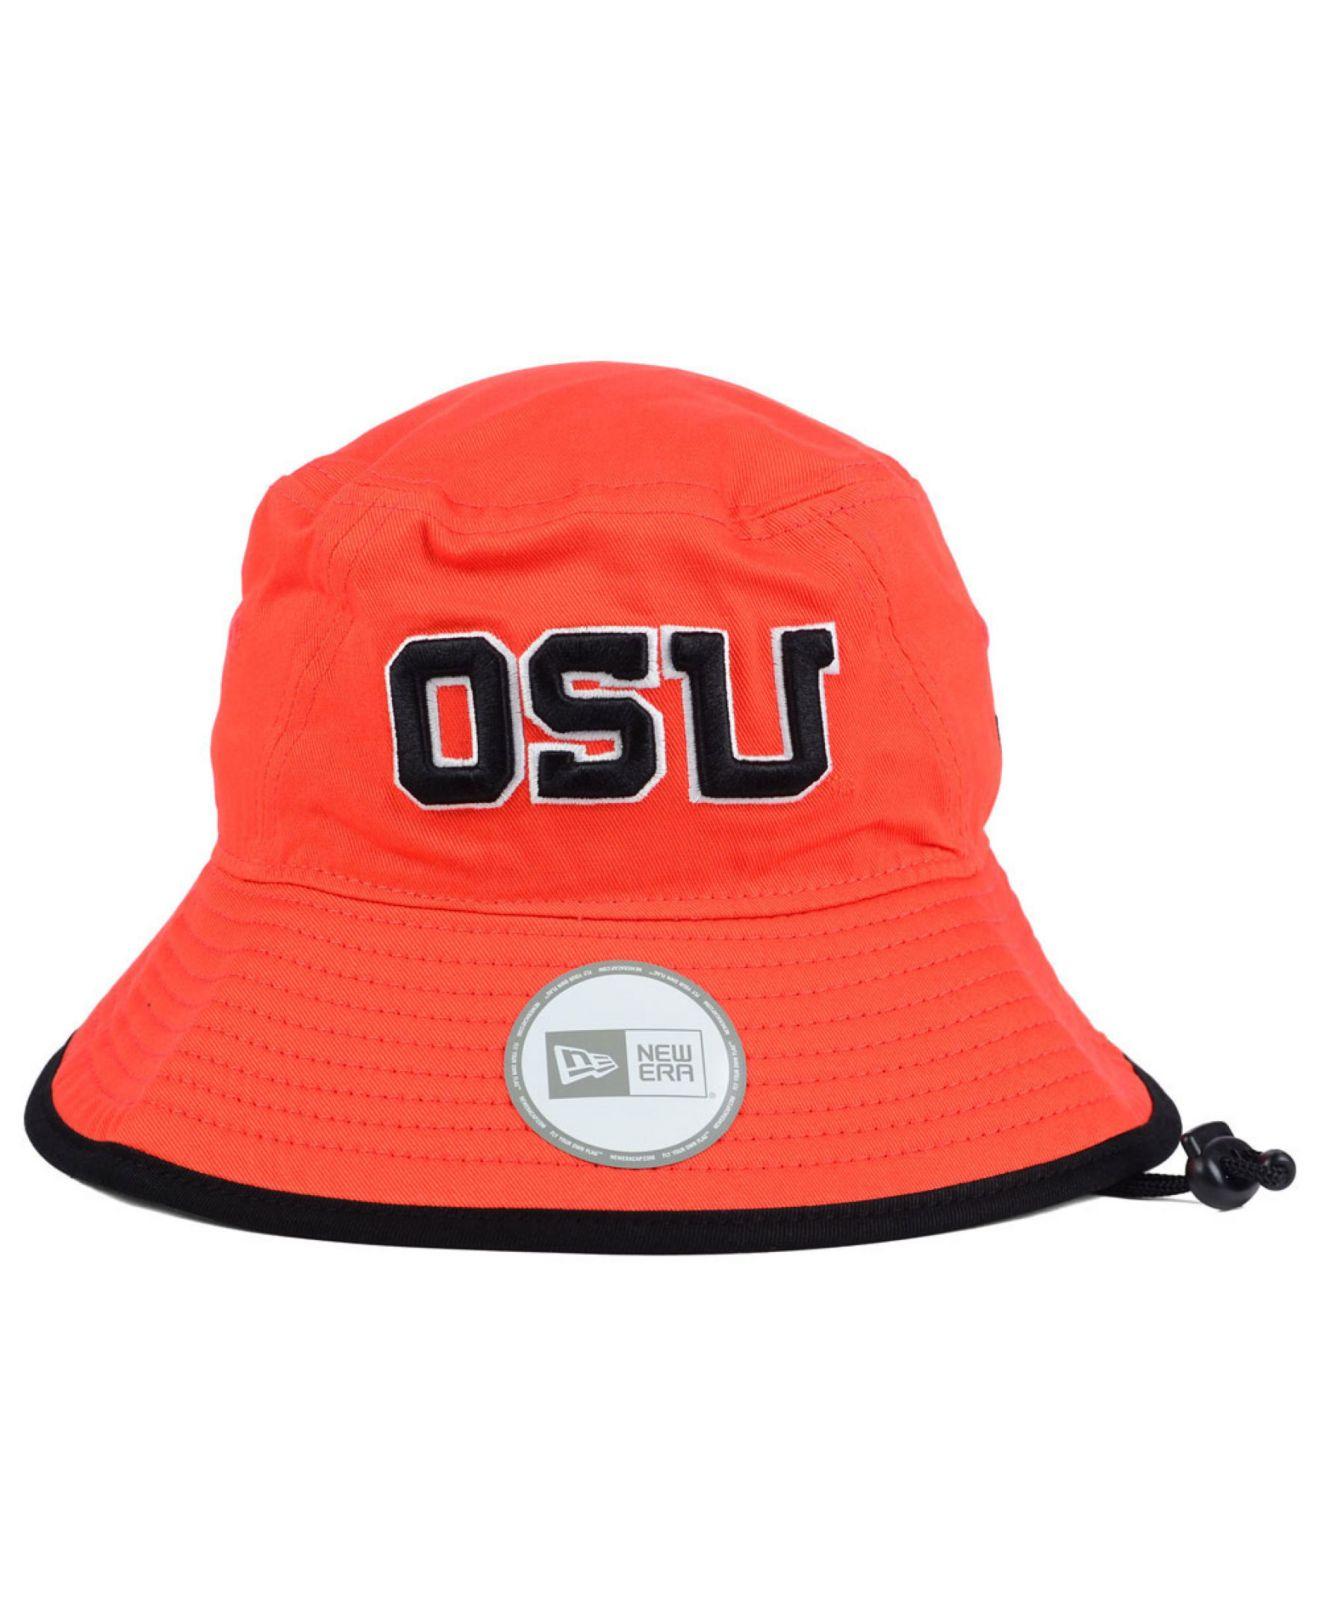 half off 3f108 39567 ... cheap lyst ktz oregon state beavers tip bucket hat in orange for men  0ed6a c40ef